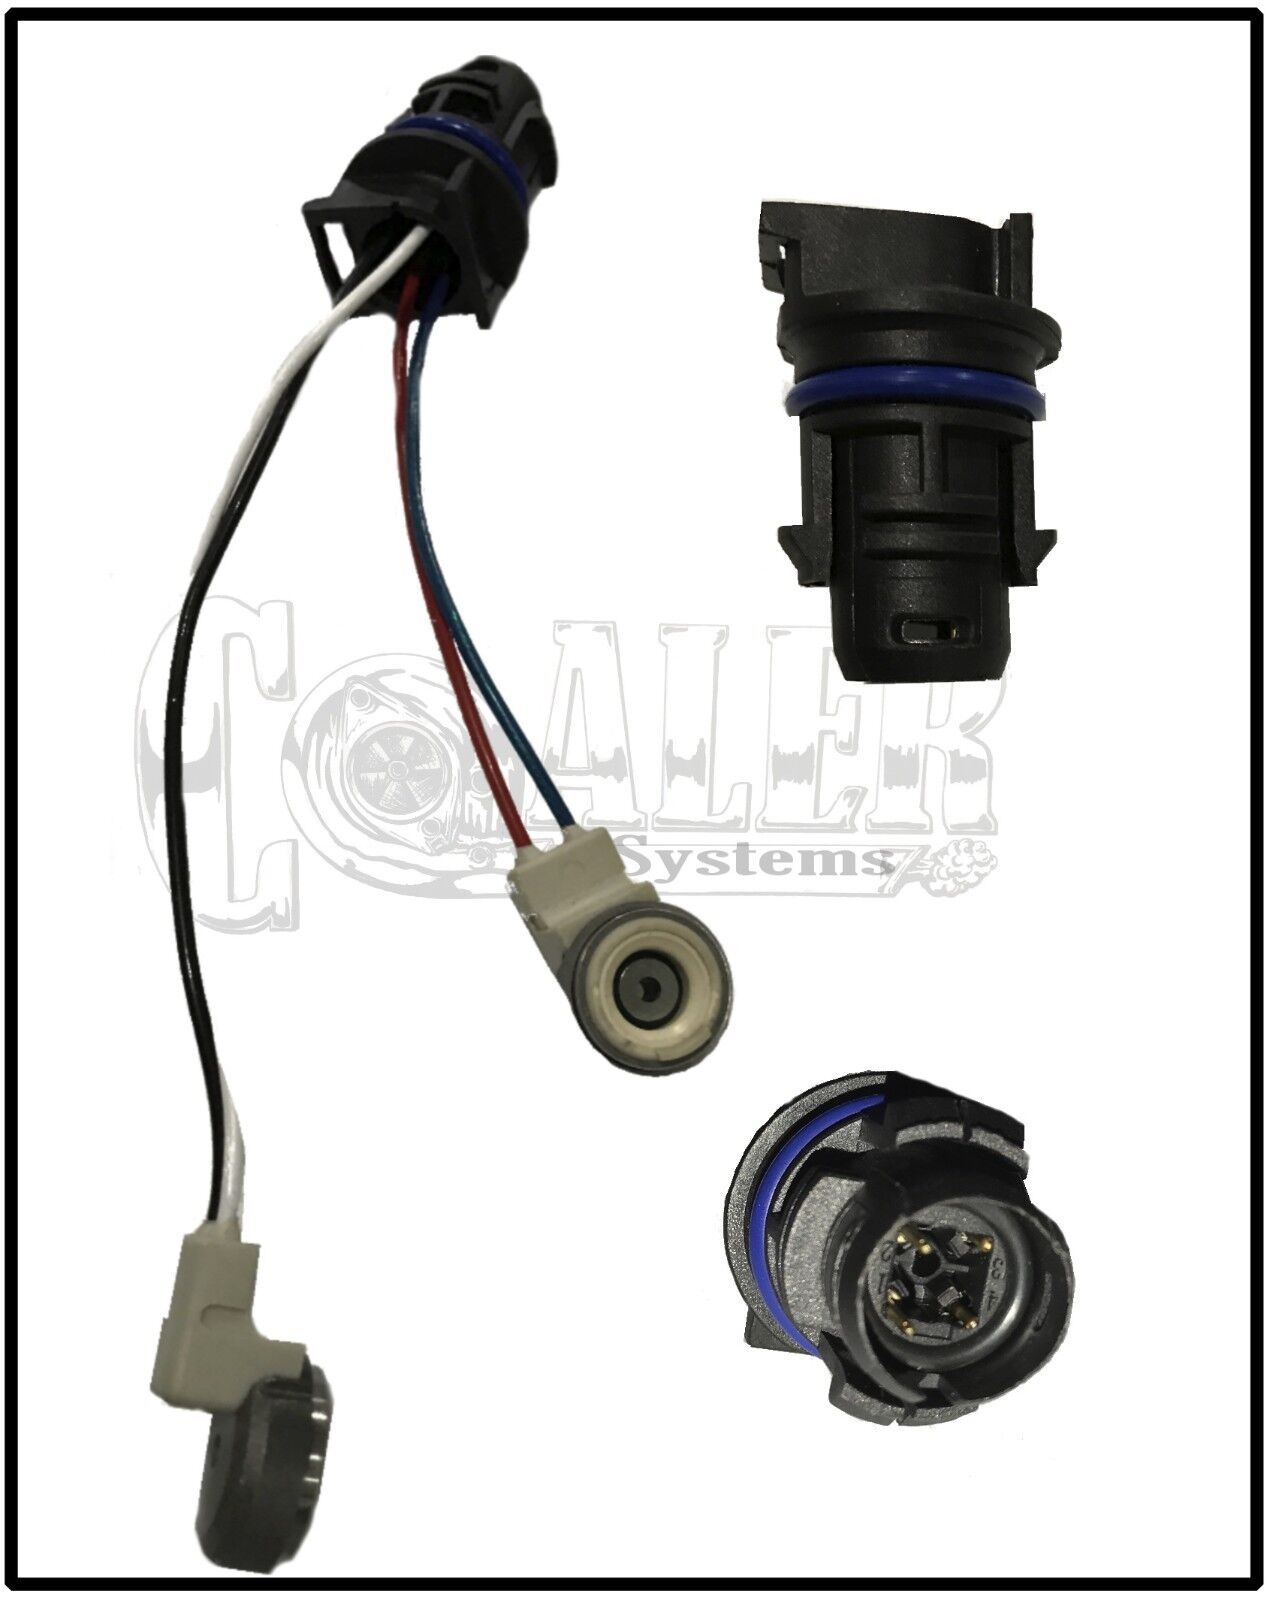 03-10 6.0L Ford Powerstroke Injector Solenoid Plug Kit 3052